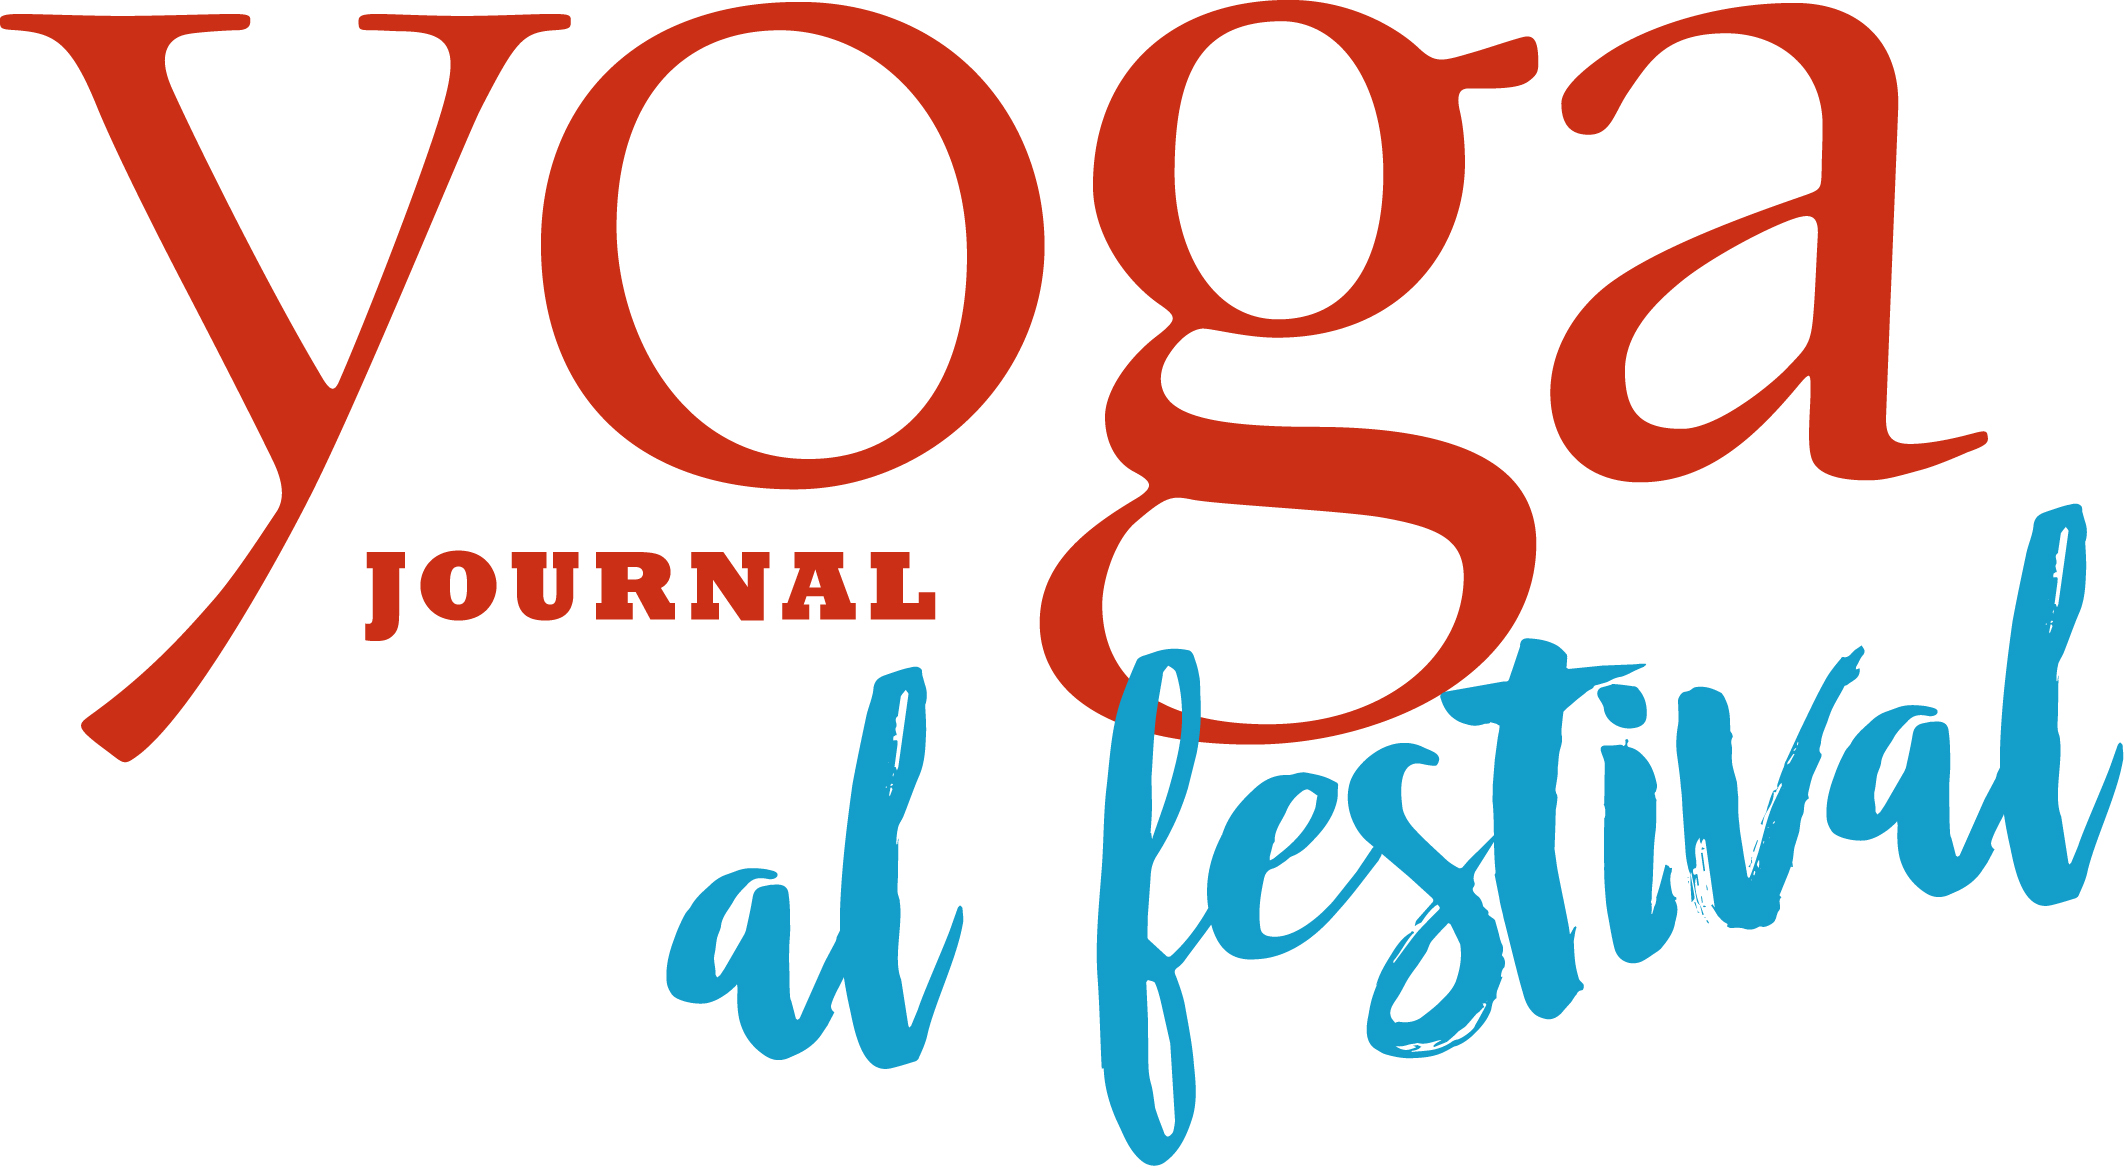 YogaJournal al festival_logo.indd